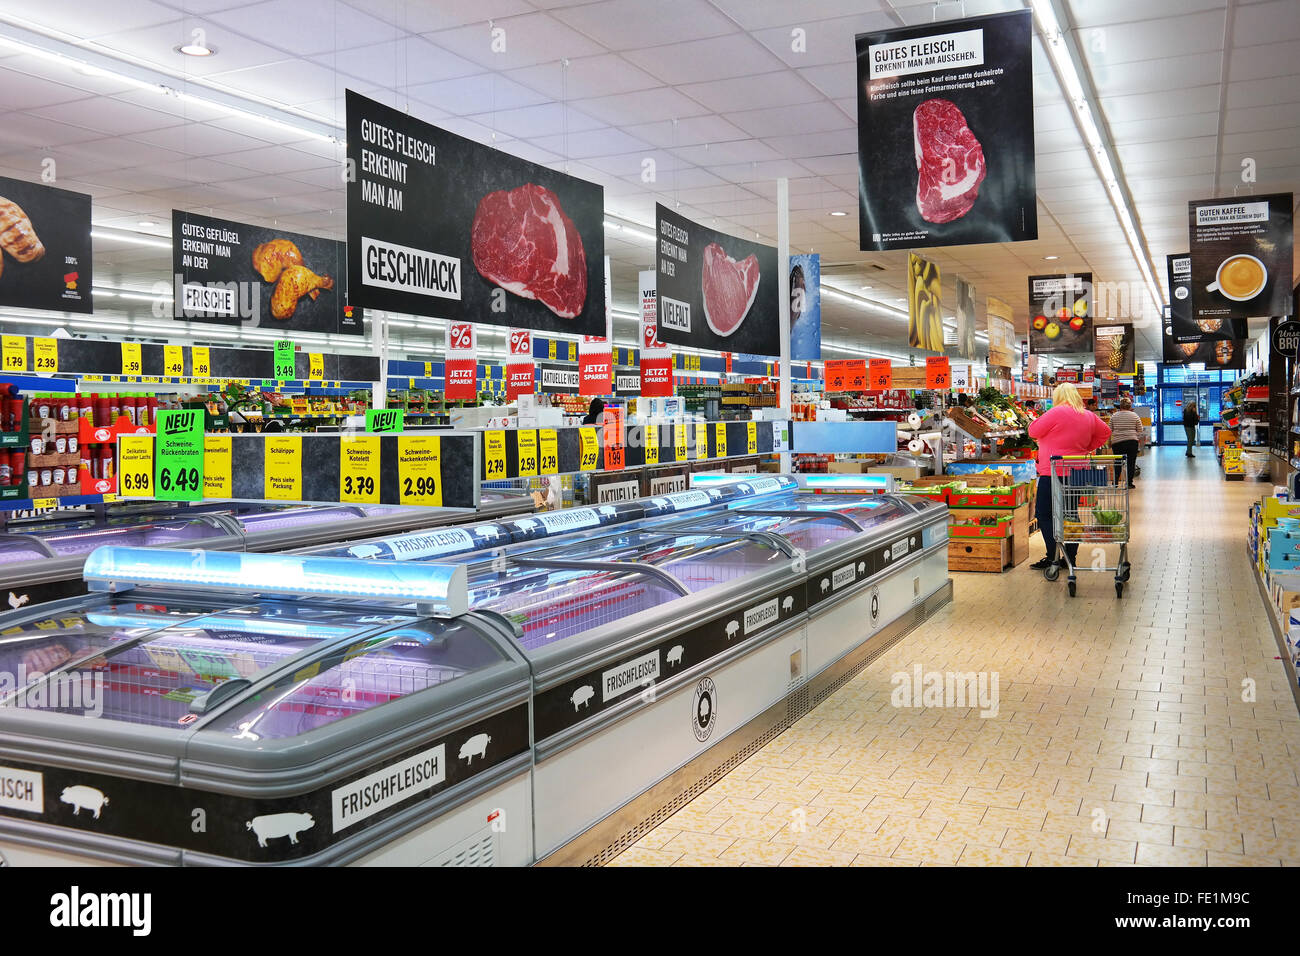 Inside a Lidl discount supermarket - Stock Image